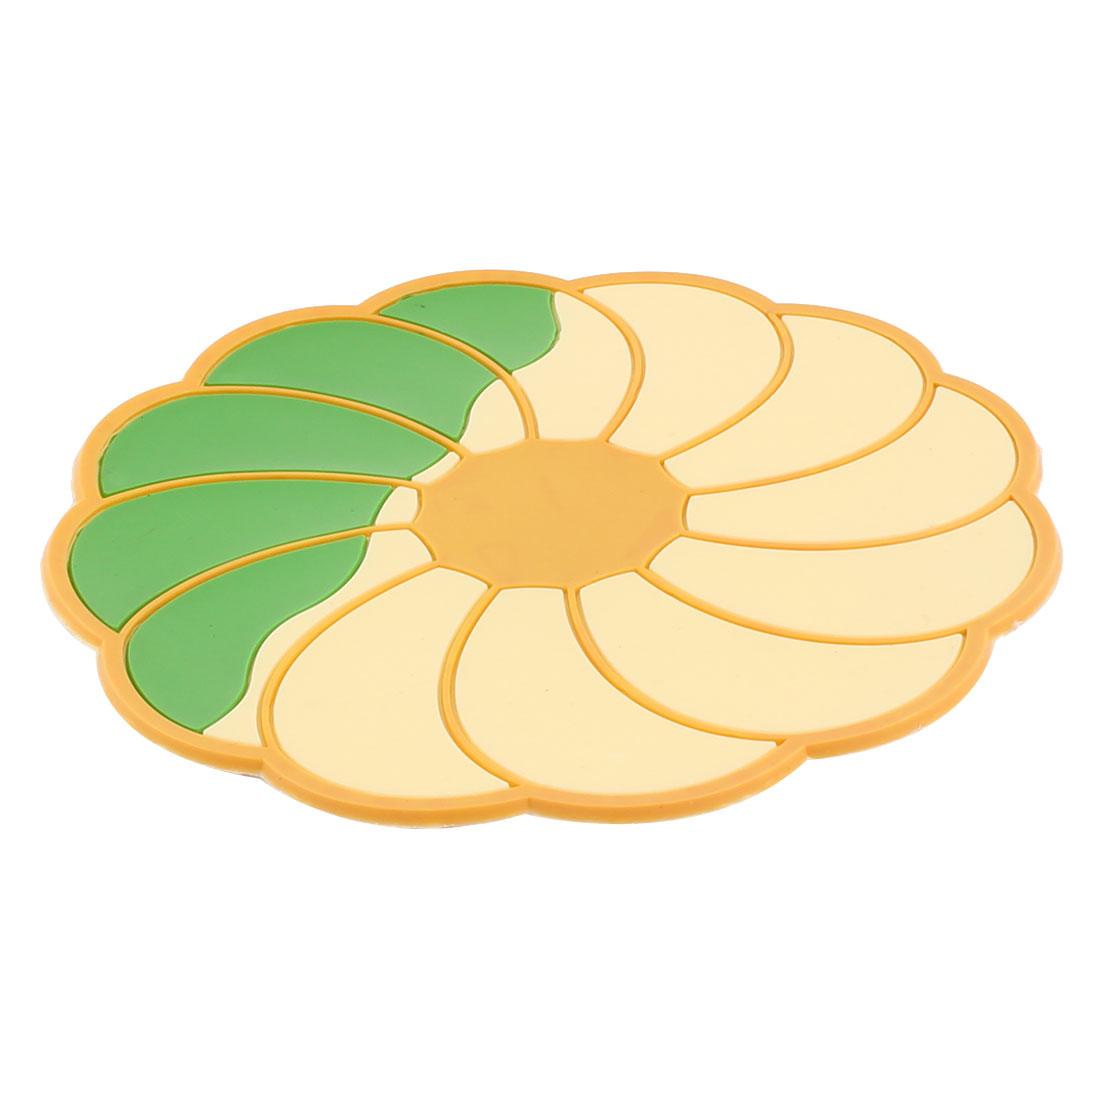 Restaurant Kitchen Flowers Shaped Non-Slip Heat Resistant Insulation Coasters Placemat